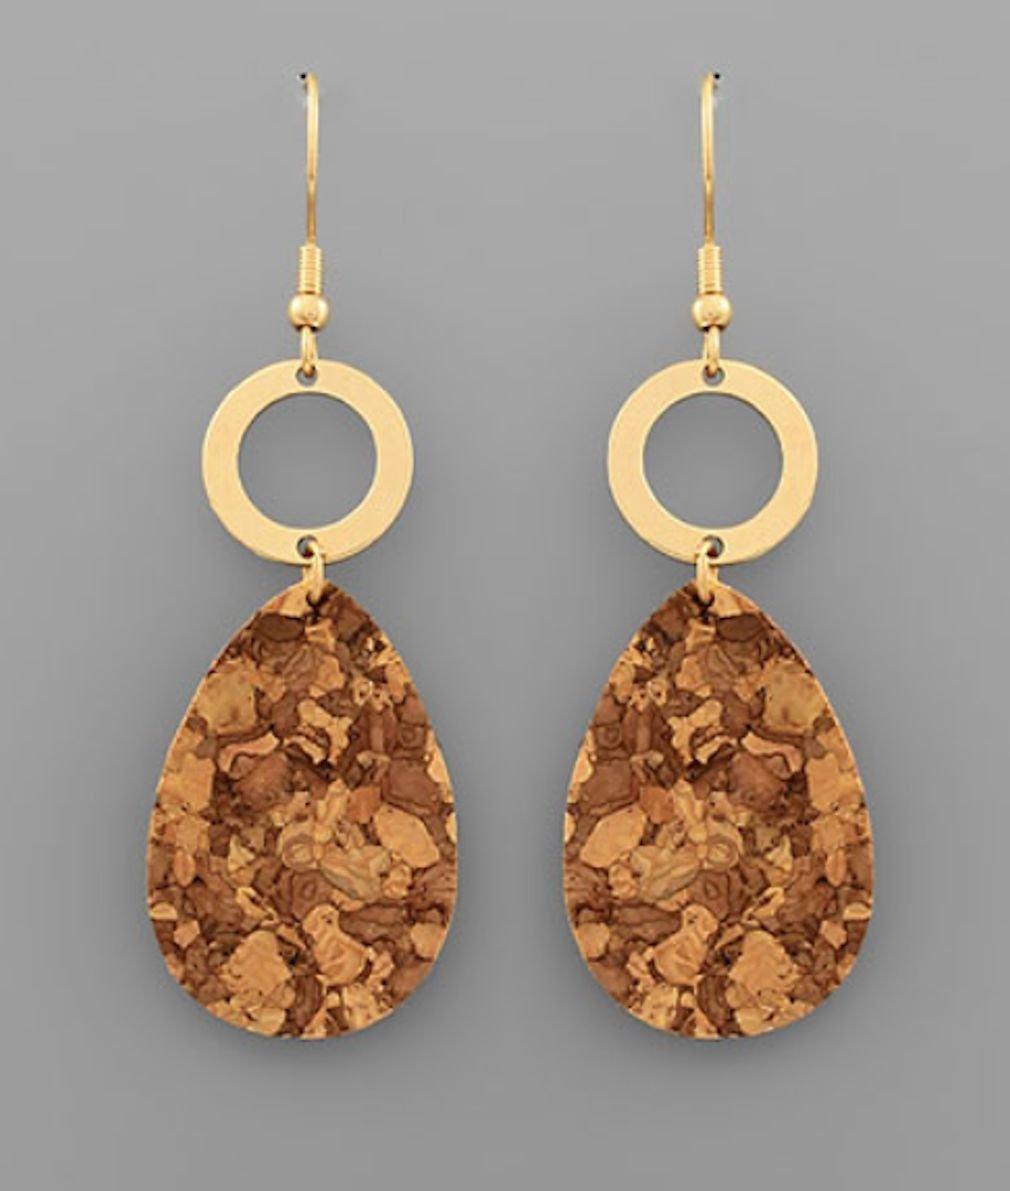 Teardrop Cork and Circle Earrings